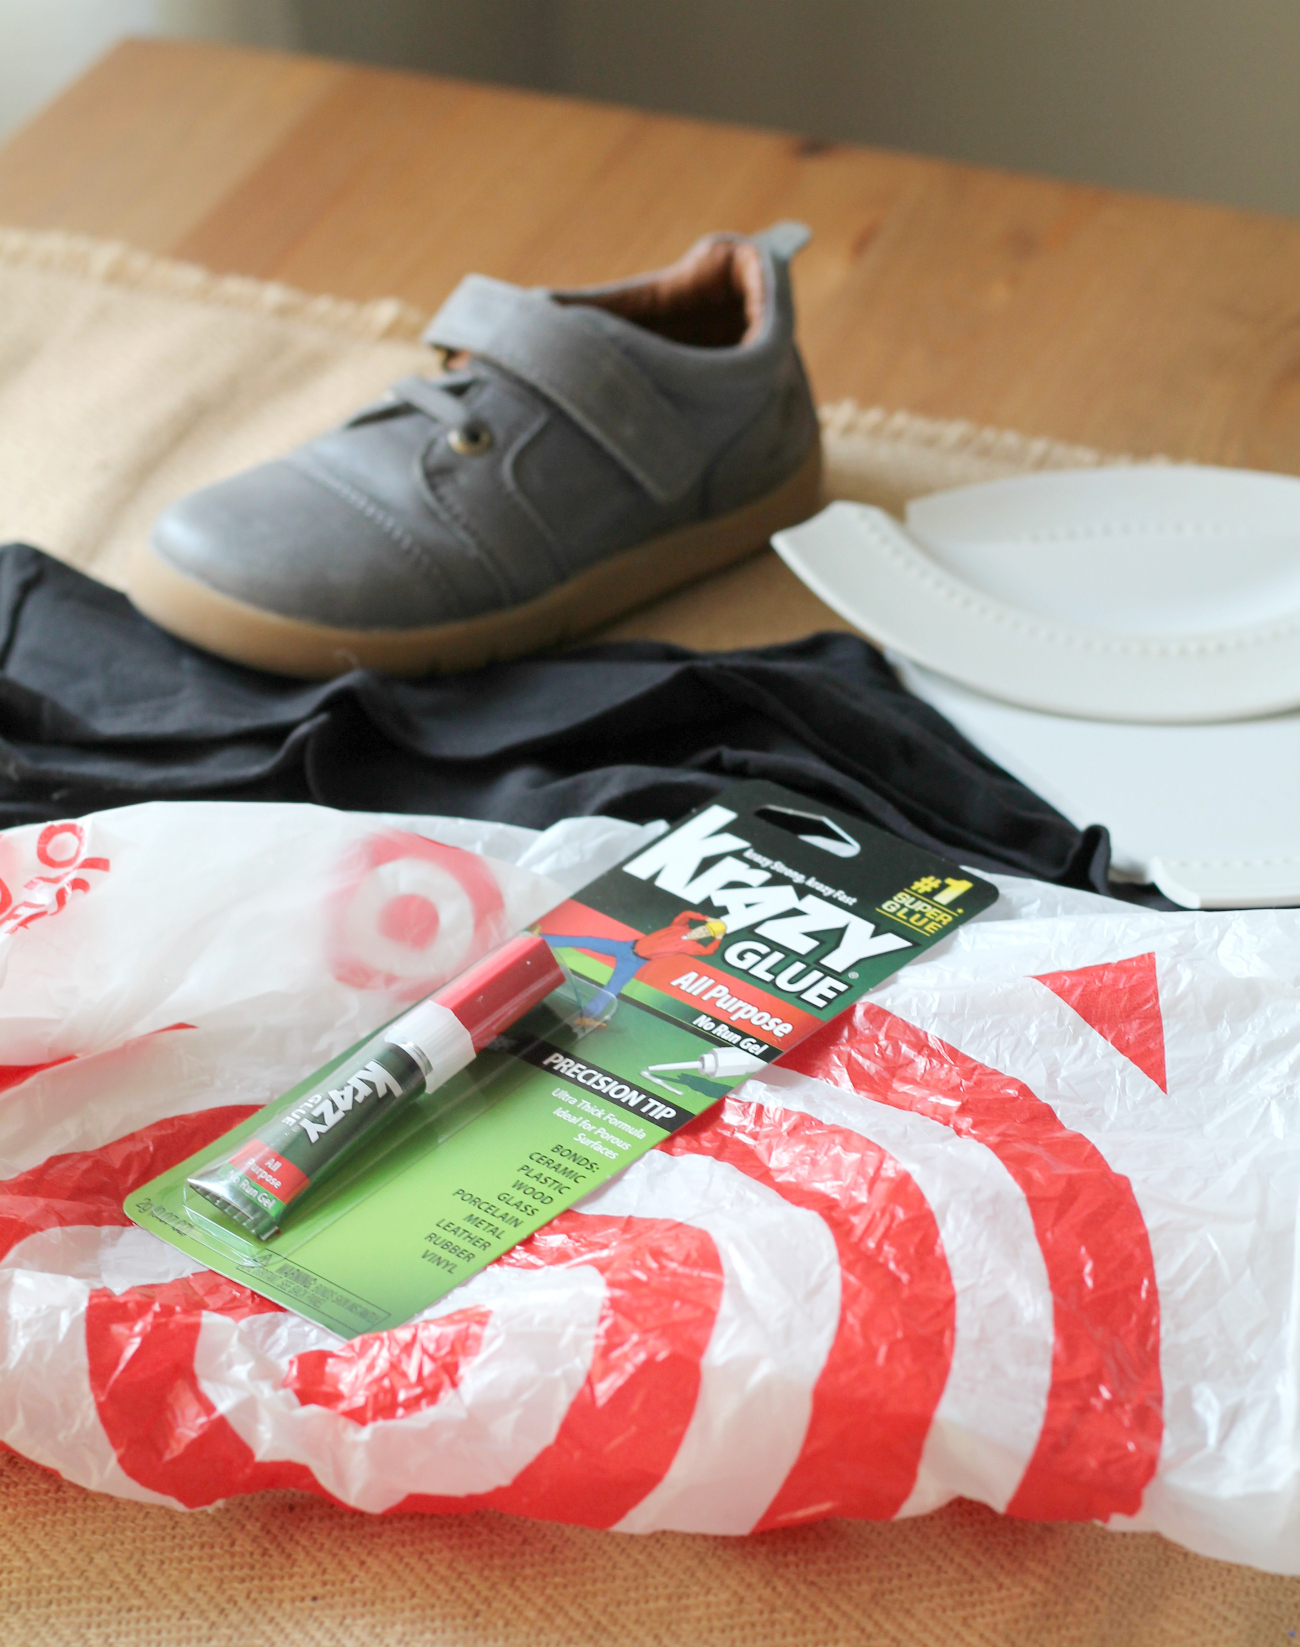 4 Everyday Uses for Krazy Glue